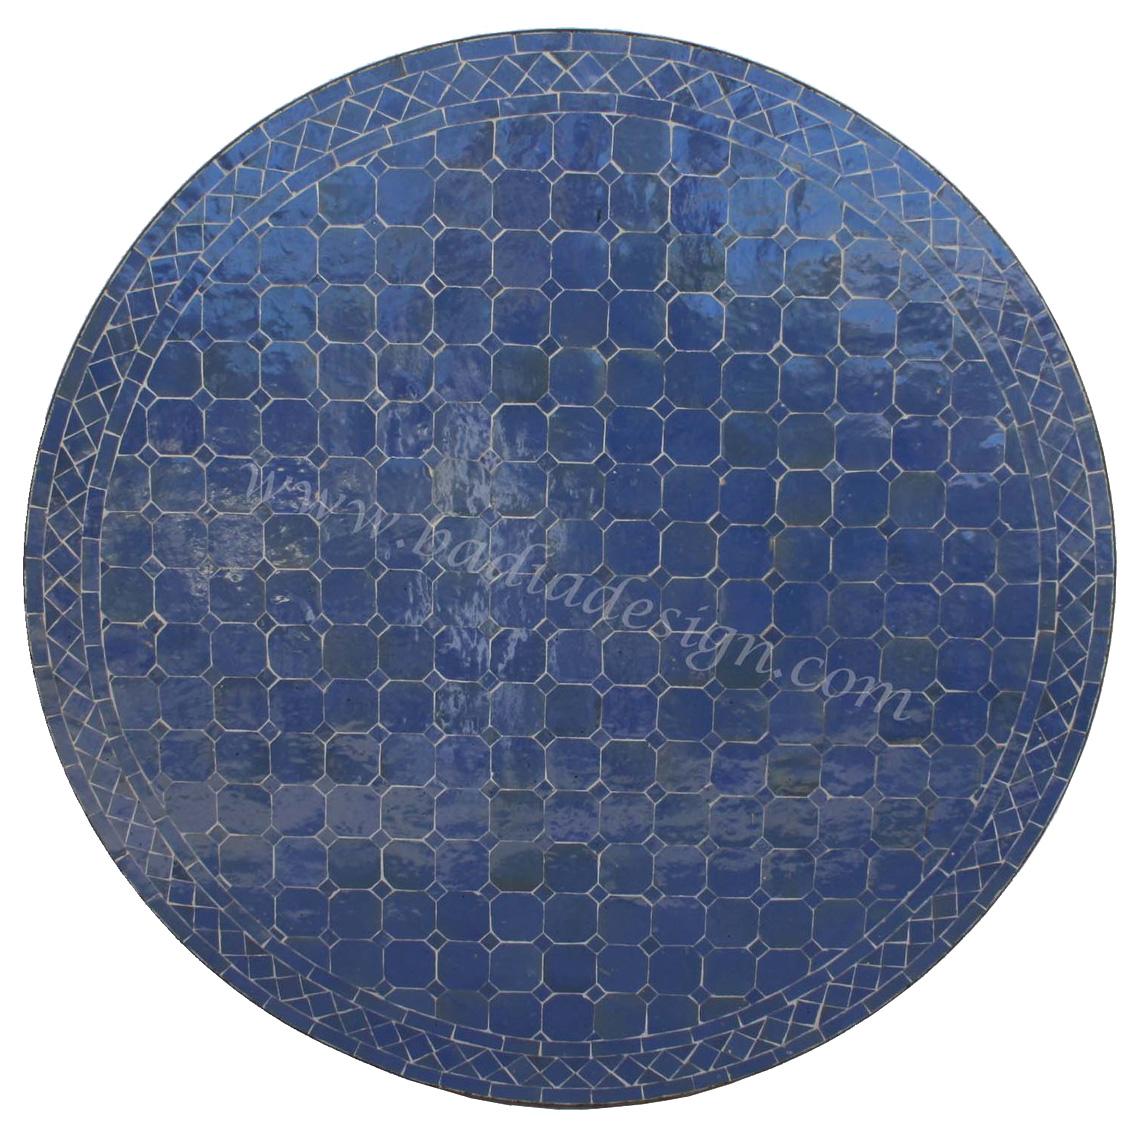 moroccan-ceramic-tile-table-top-mtr469.jpg